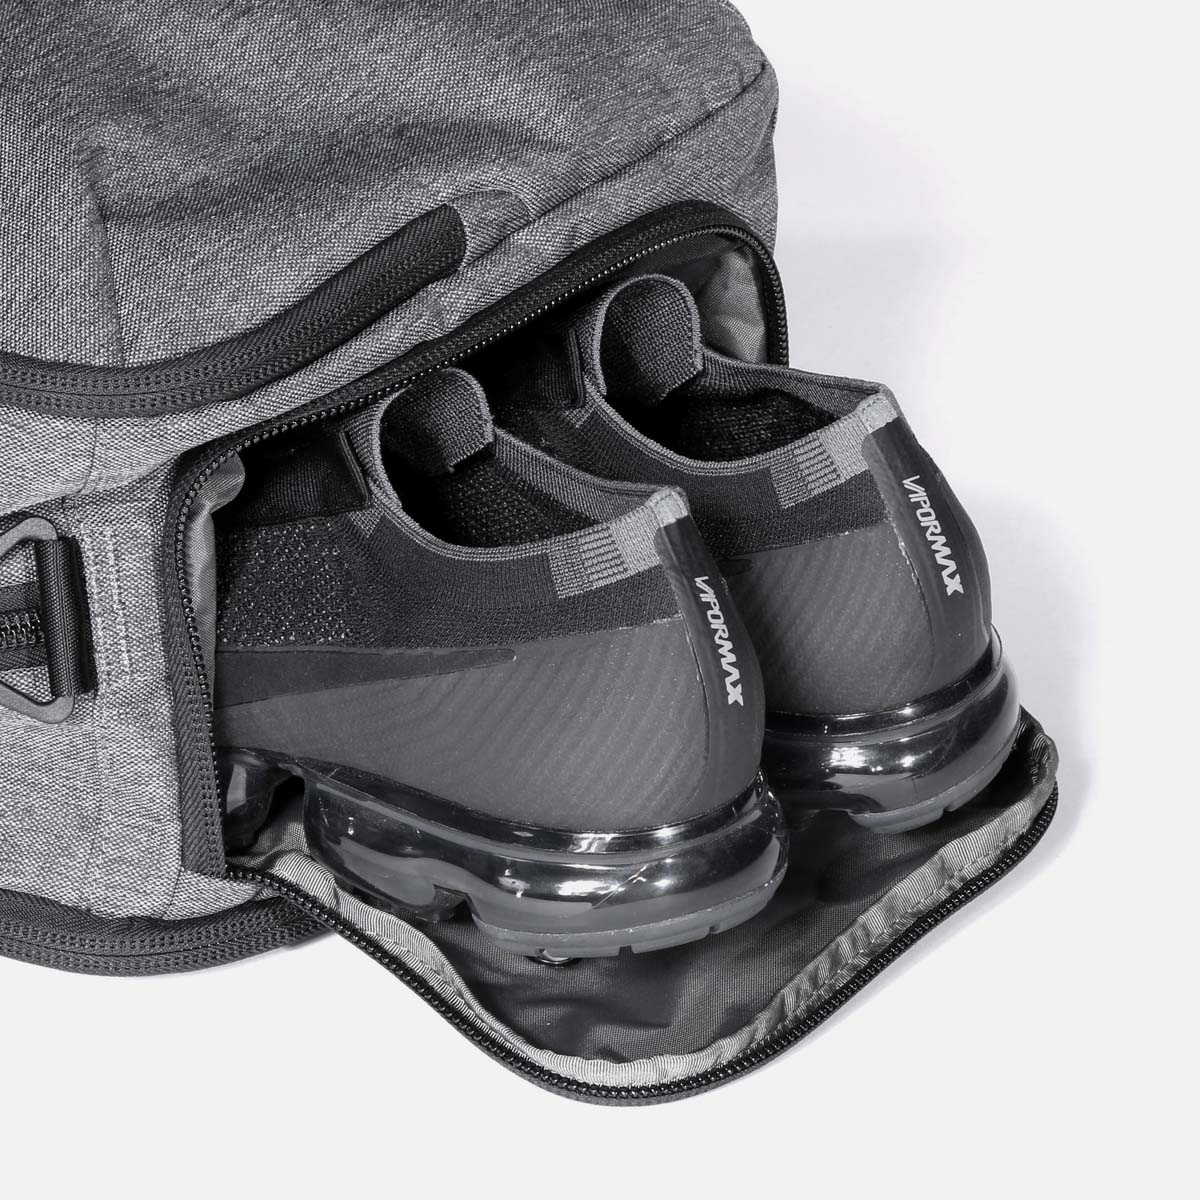 12009_gd2s_gray_shoes.jpg